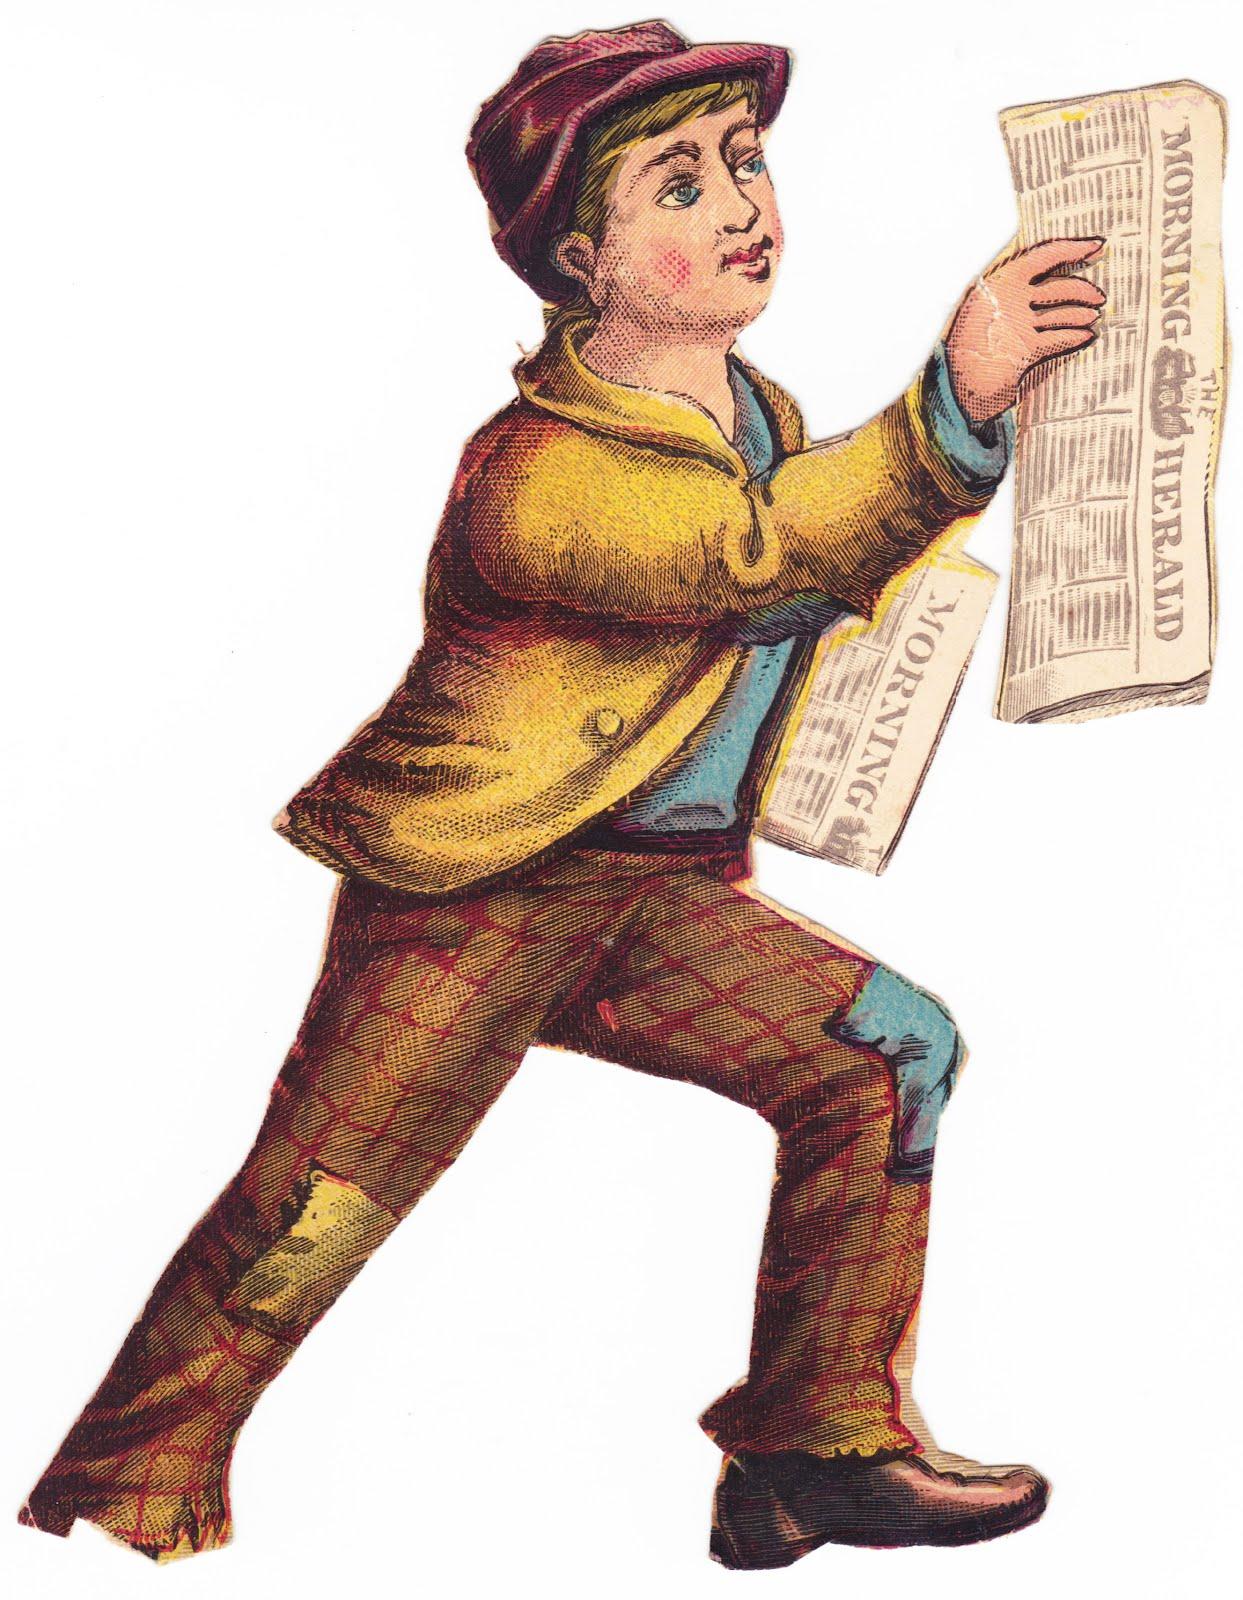 Vintage Newspaper Boy 1 Boy Hawking Newspapers i